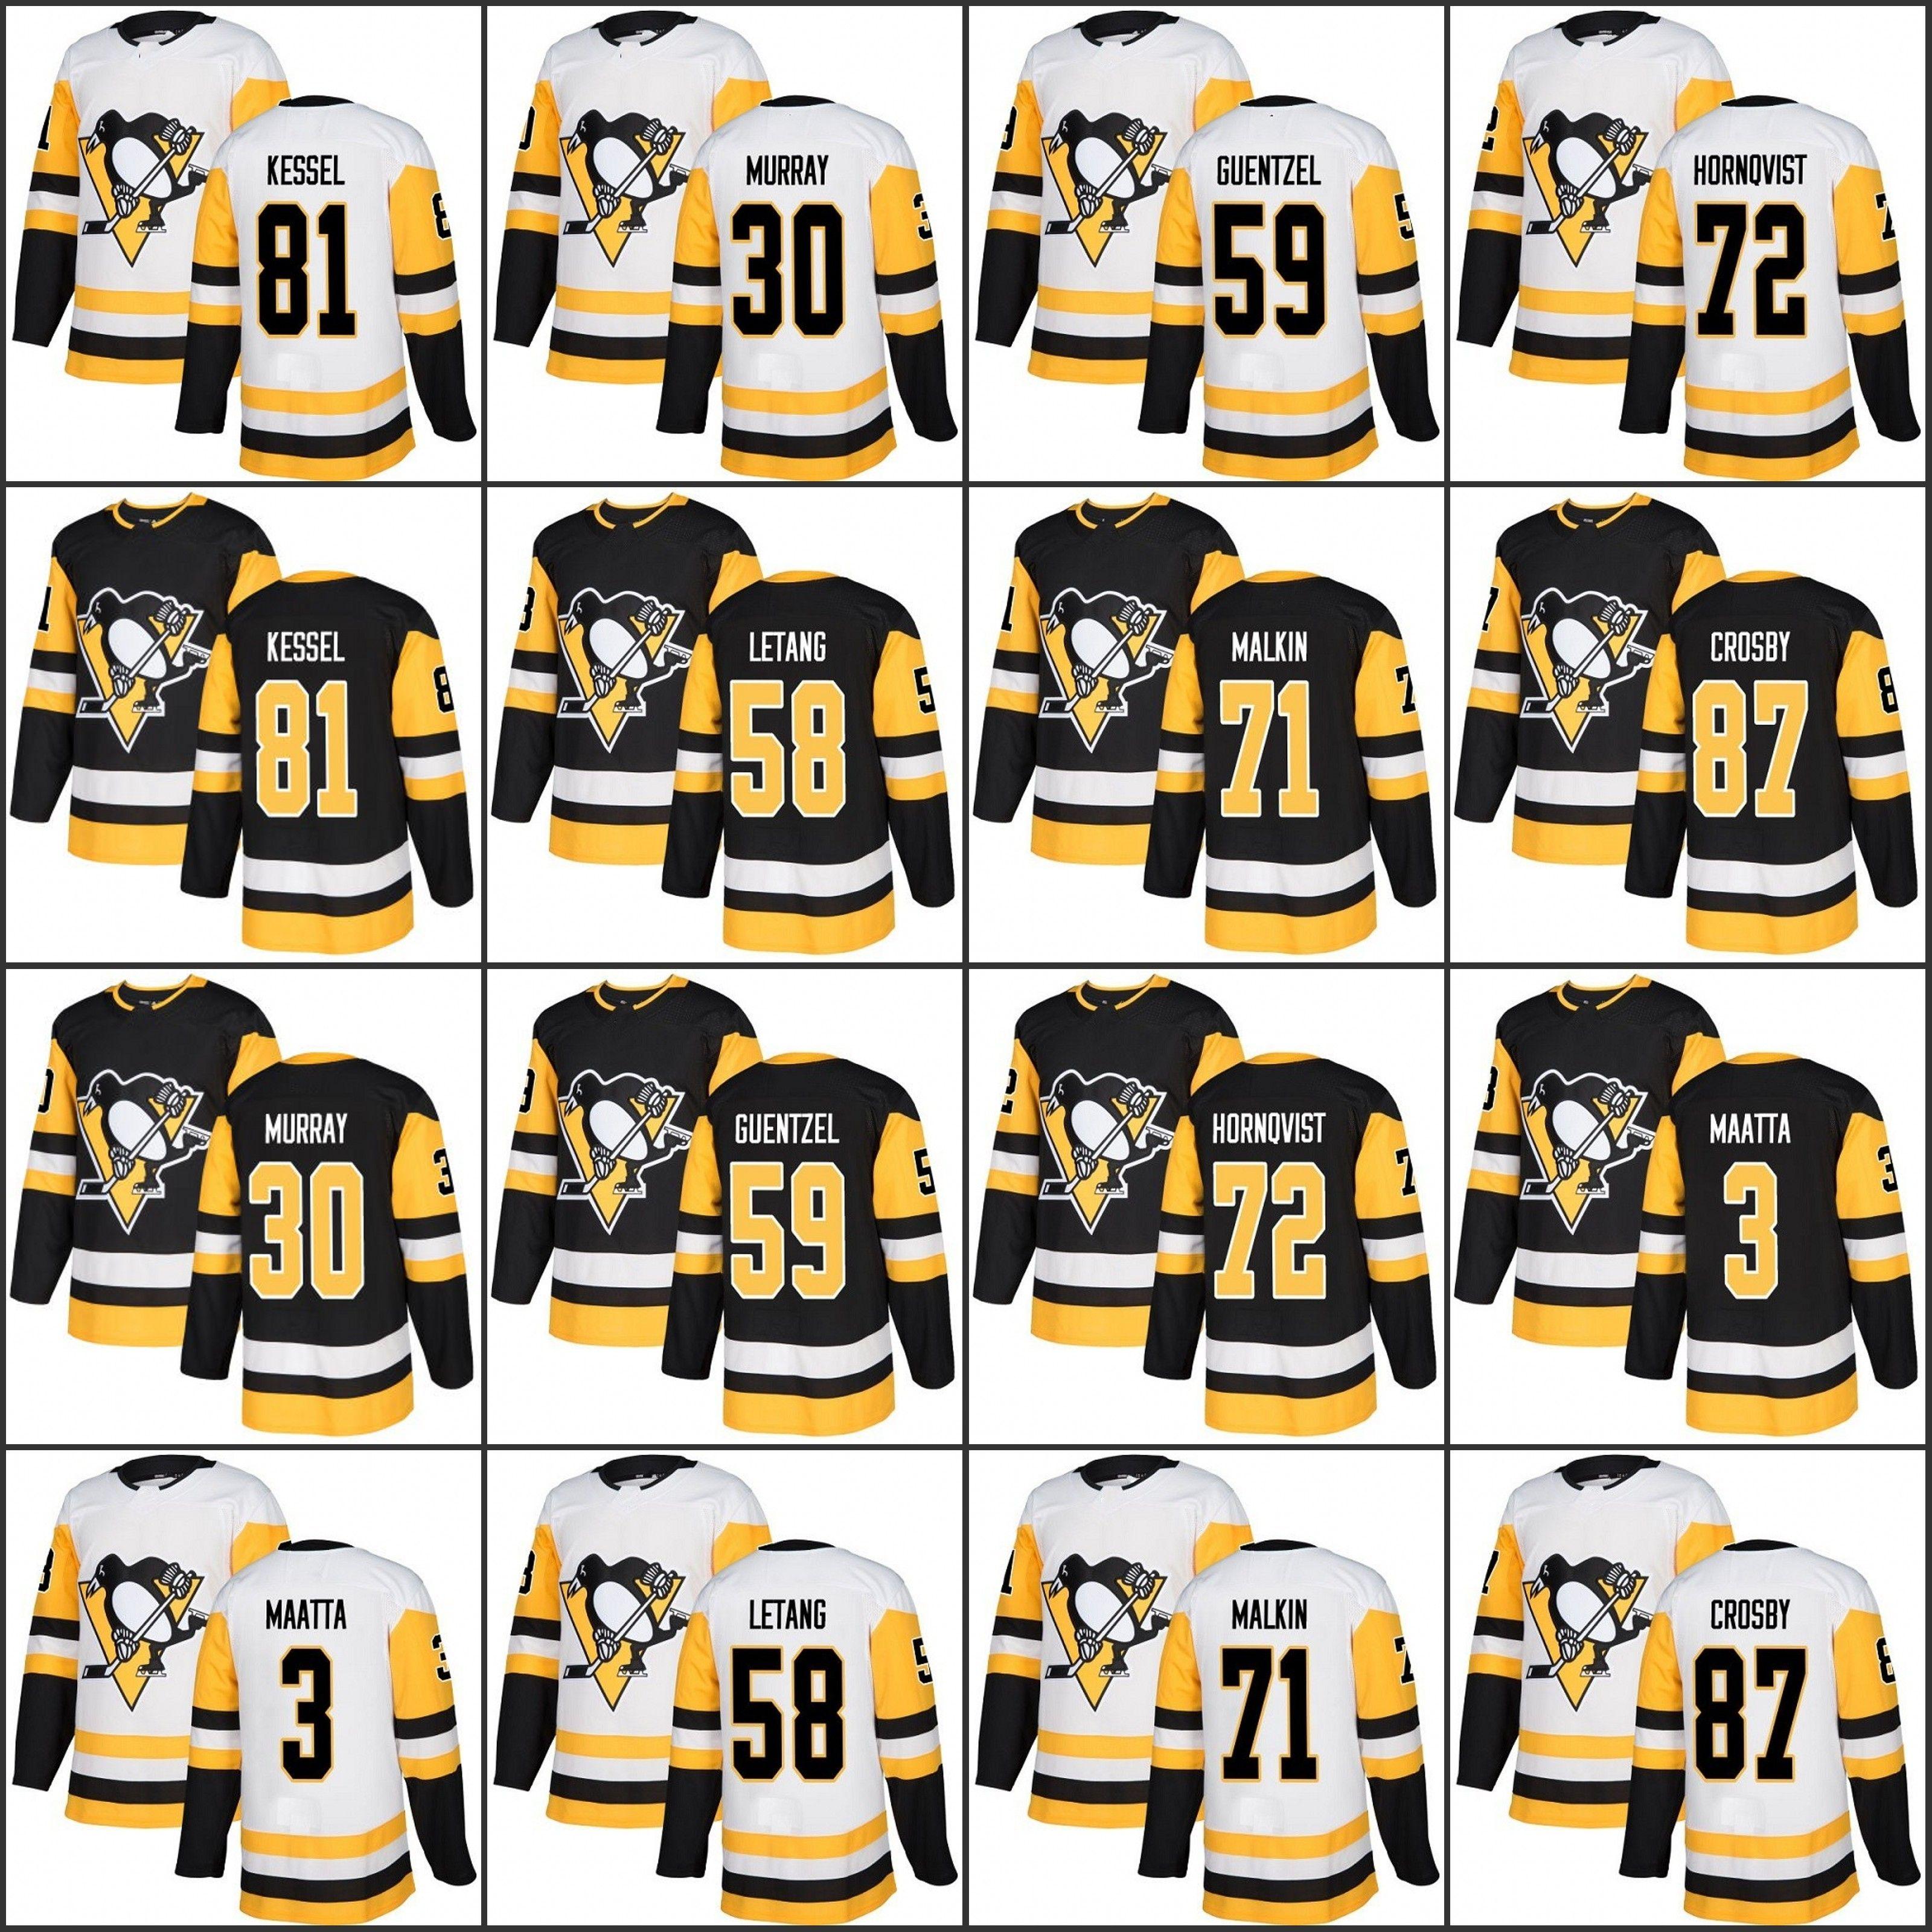 efba6b056 2019 Men S Youth Women Pittsburgh Penguins 71 Evgeni Malkin 72 Patric  Hornqvist 87 Sidney Crosby 81 Phil Kessel Kris Letang Black Home White From  B2bcn